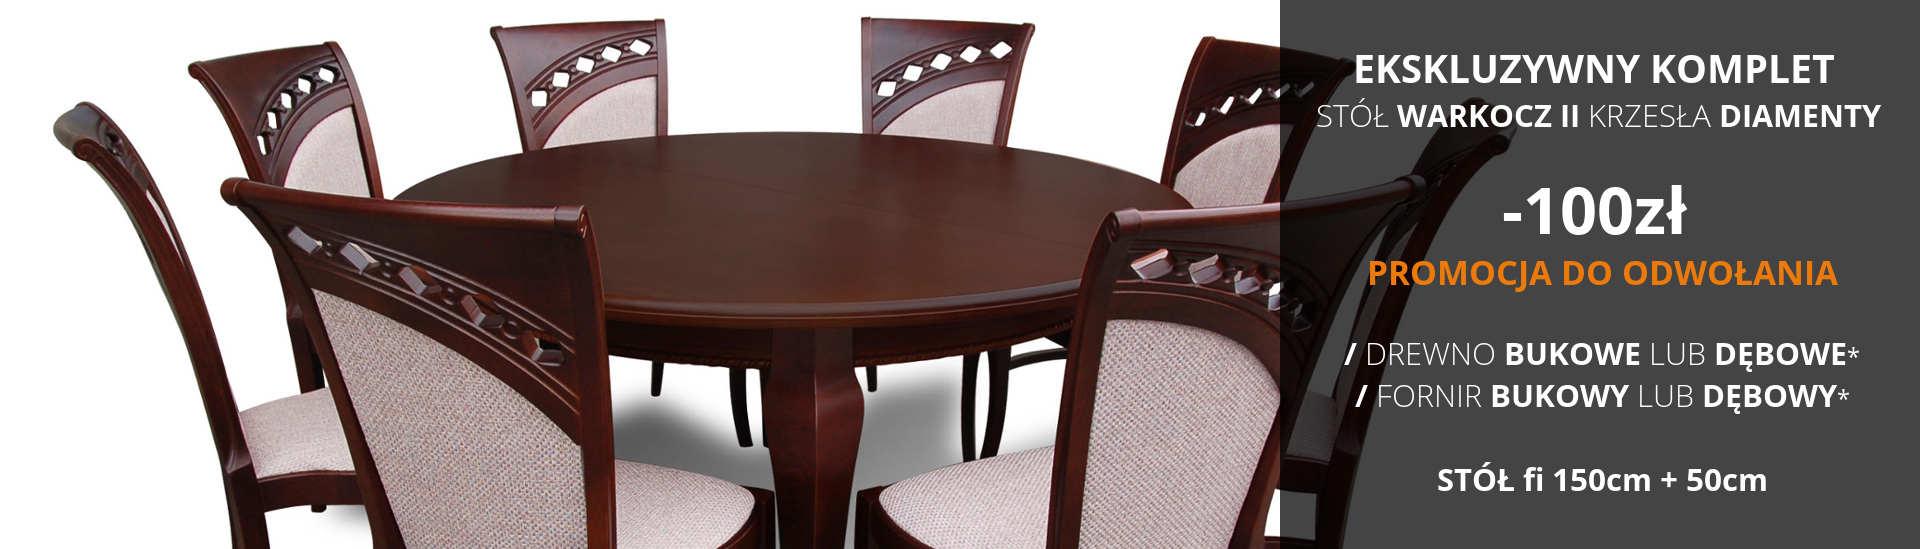 komplet-stol-okragly-warkocz-ii-krzesla-diamenty